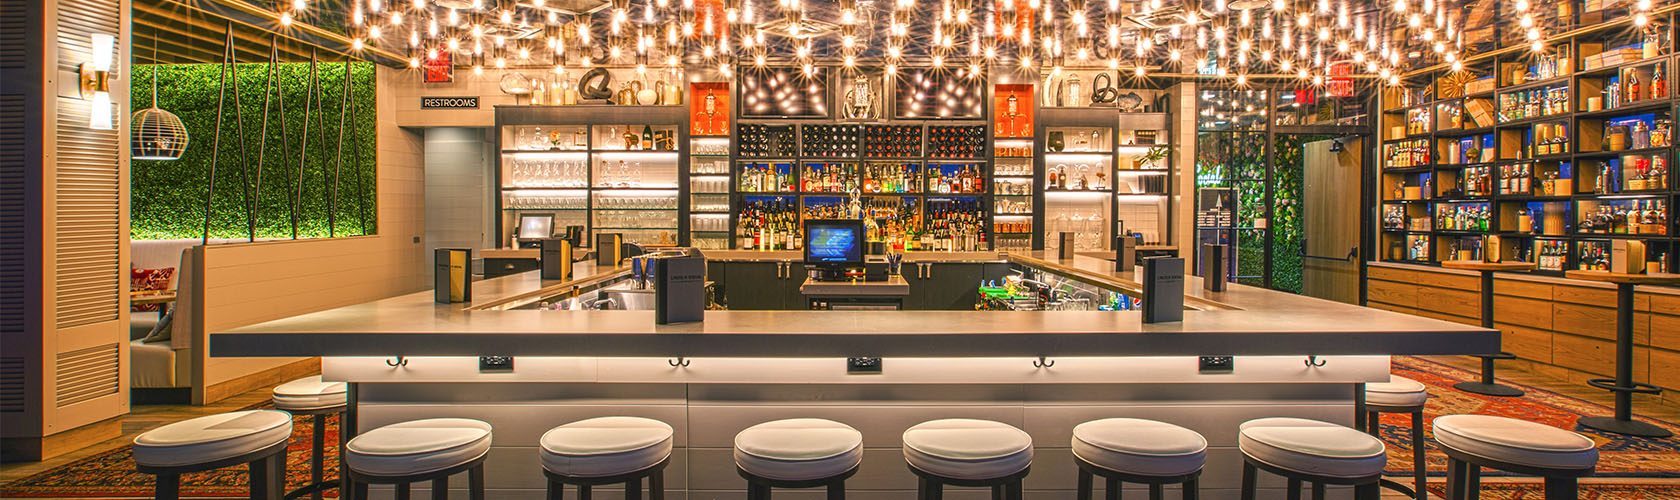 Interior of Lincoln Social bar